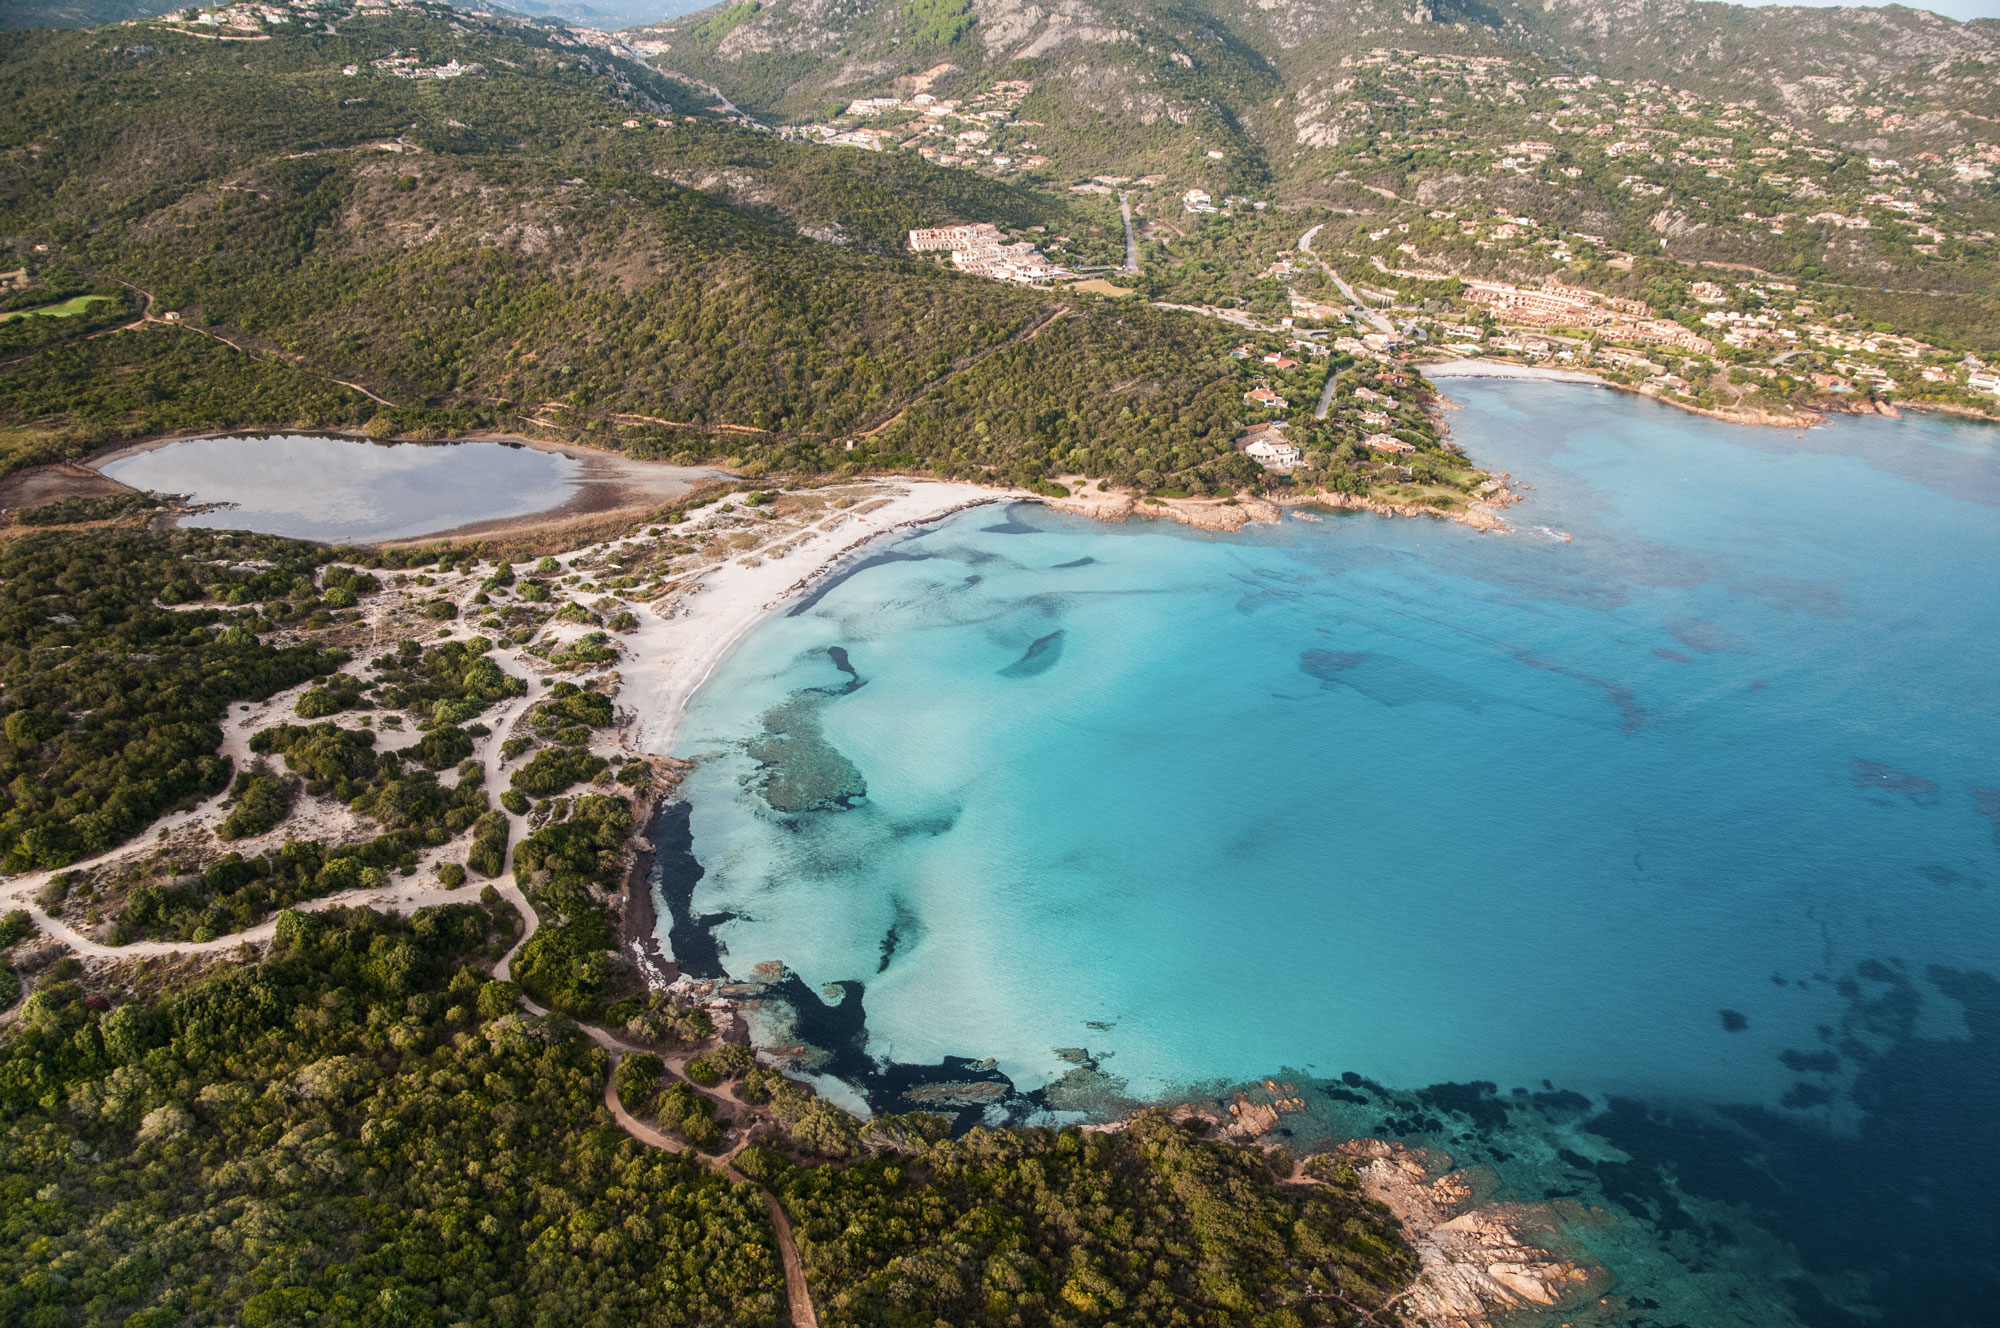 Grande Pevero, Costa Smeralda, Sardinia